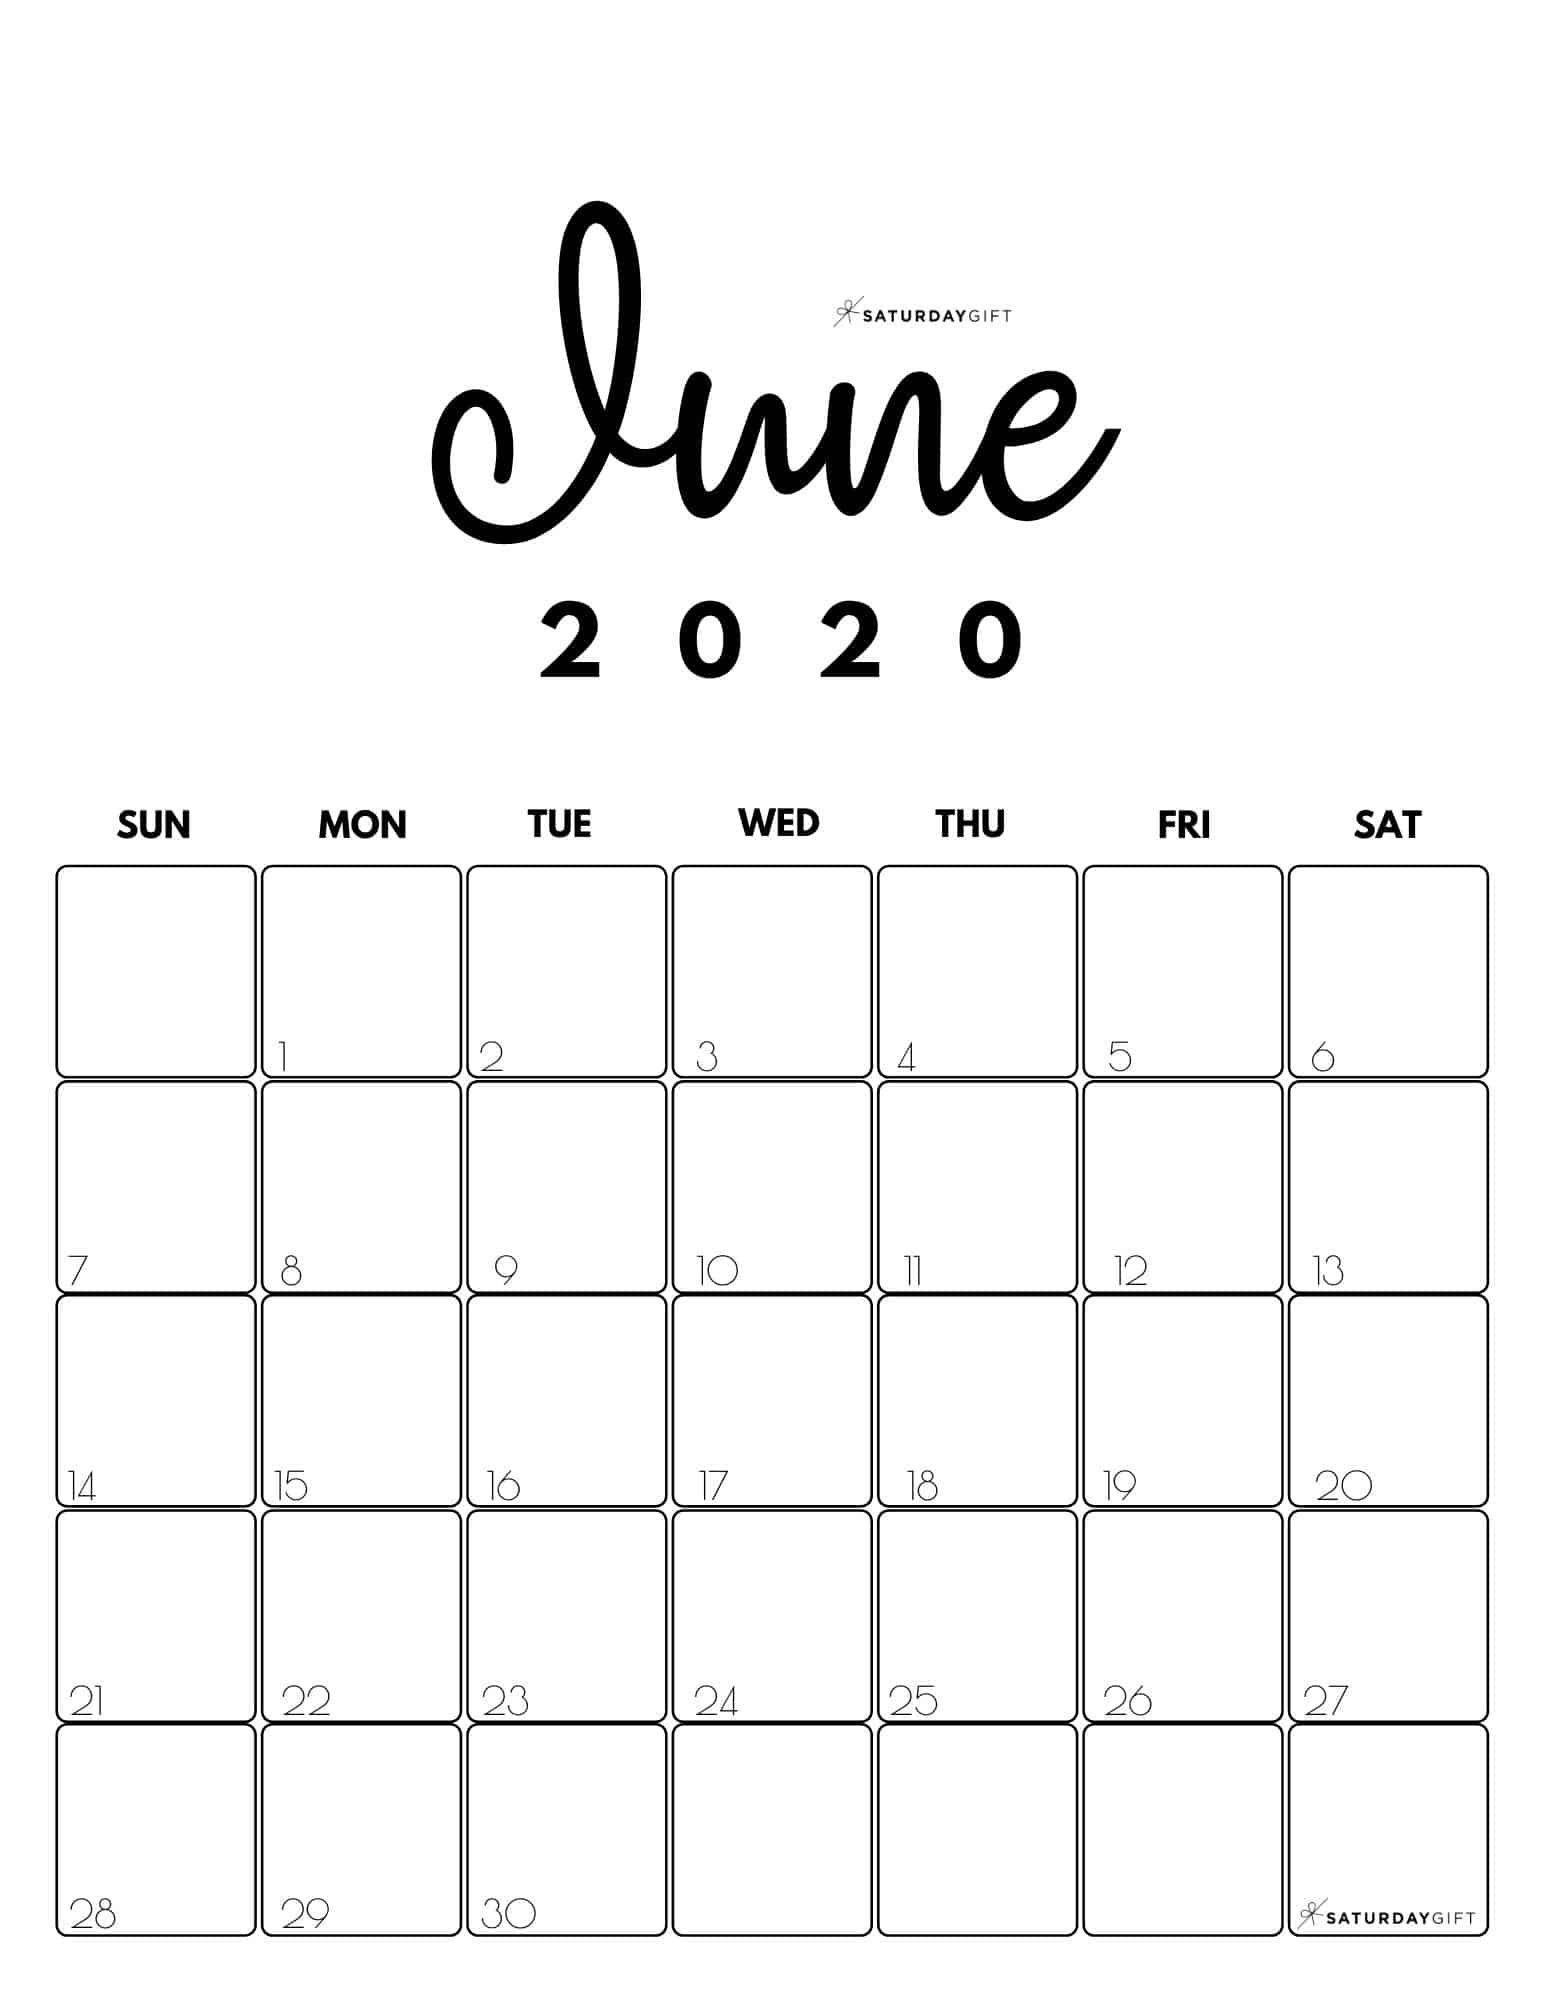 20+ June 2021 Calendar - Free Download Printable Calendar Templates ️ with June Editable Calendar 2021